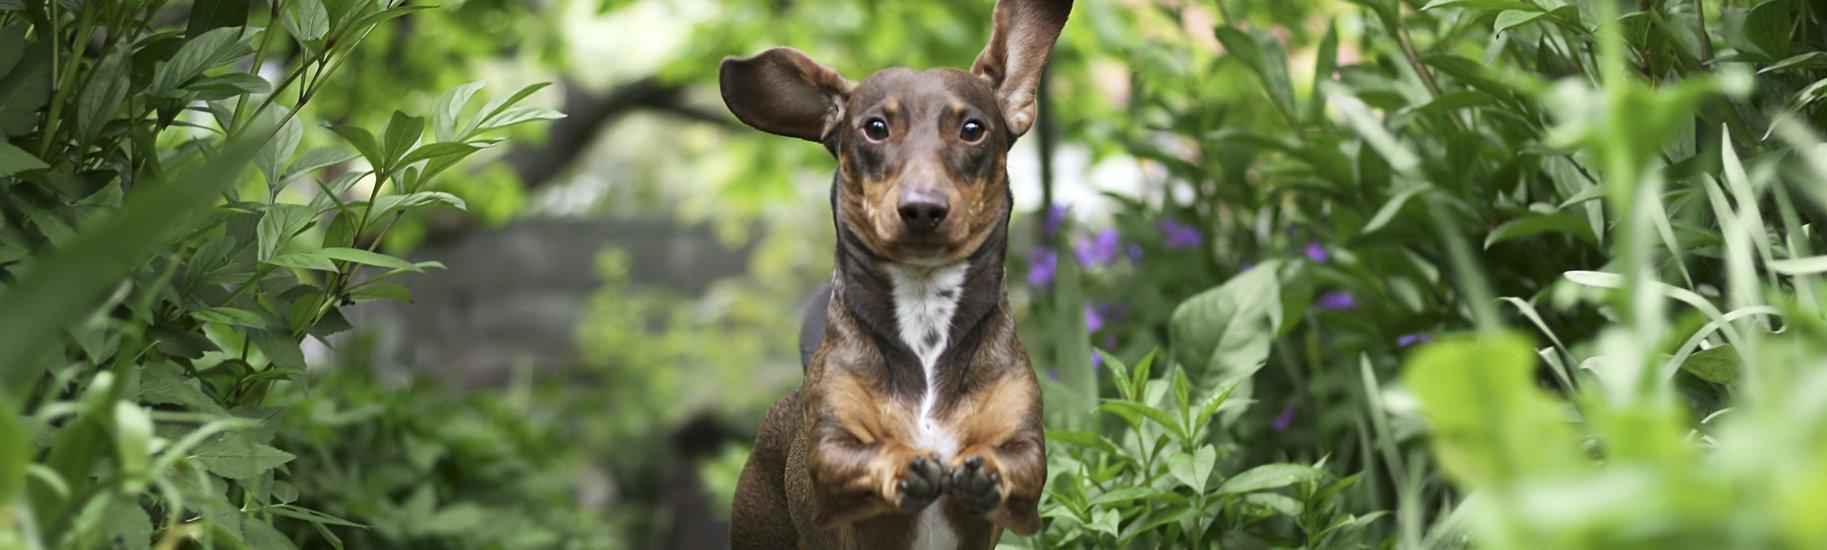 Unleashed Canine Obedience • Dog Training • Cincinnati